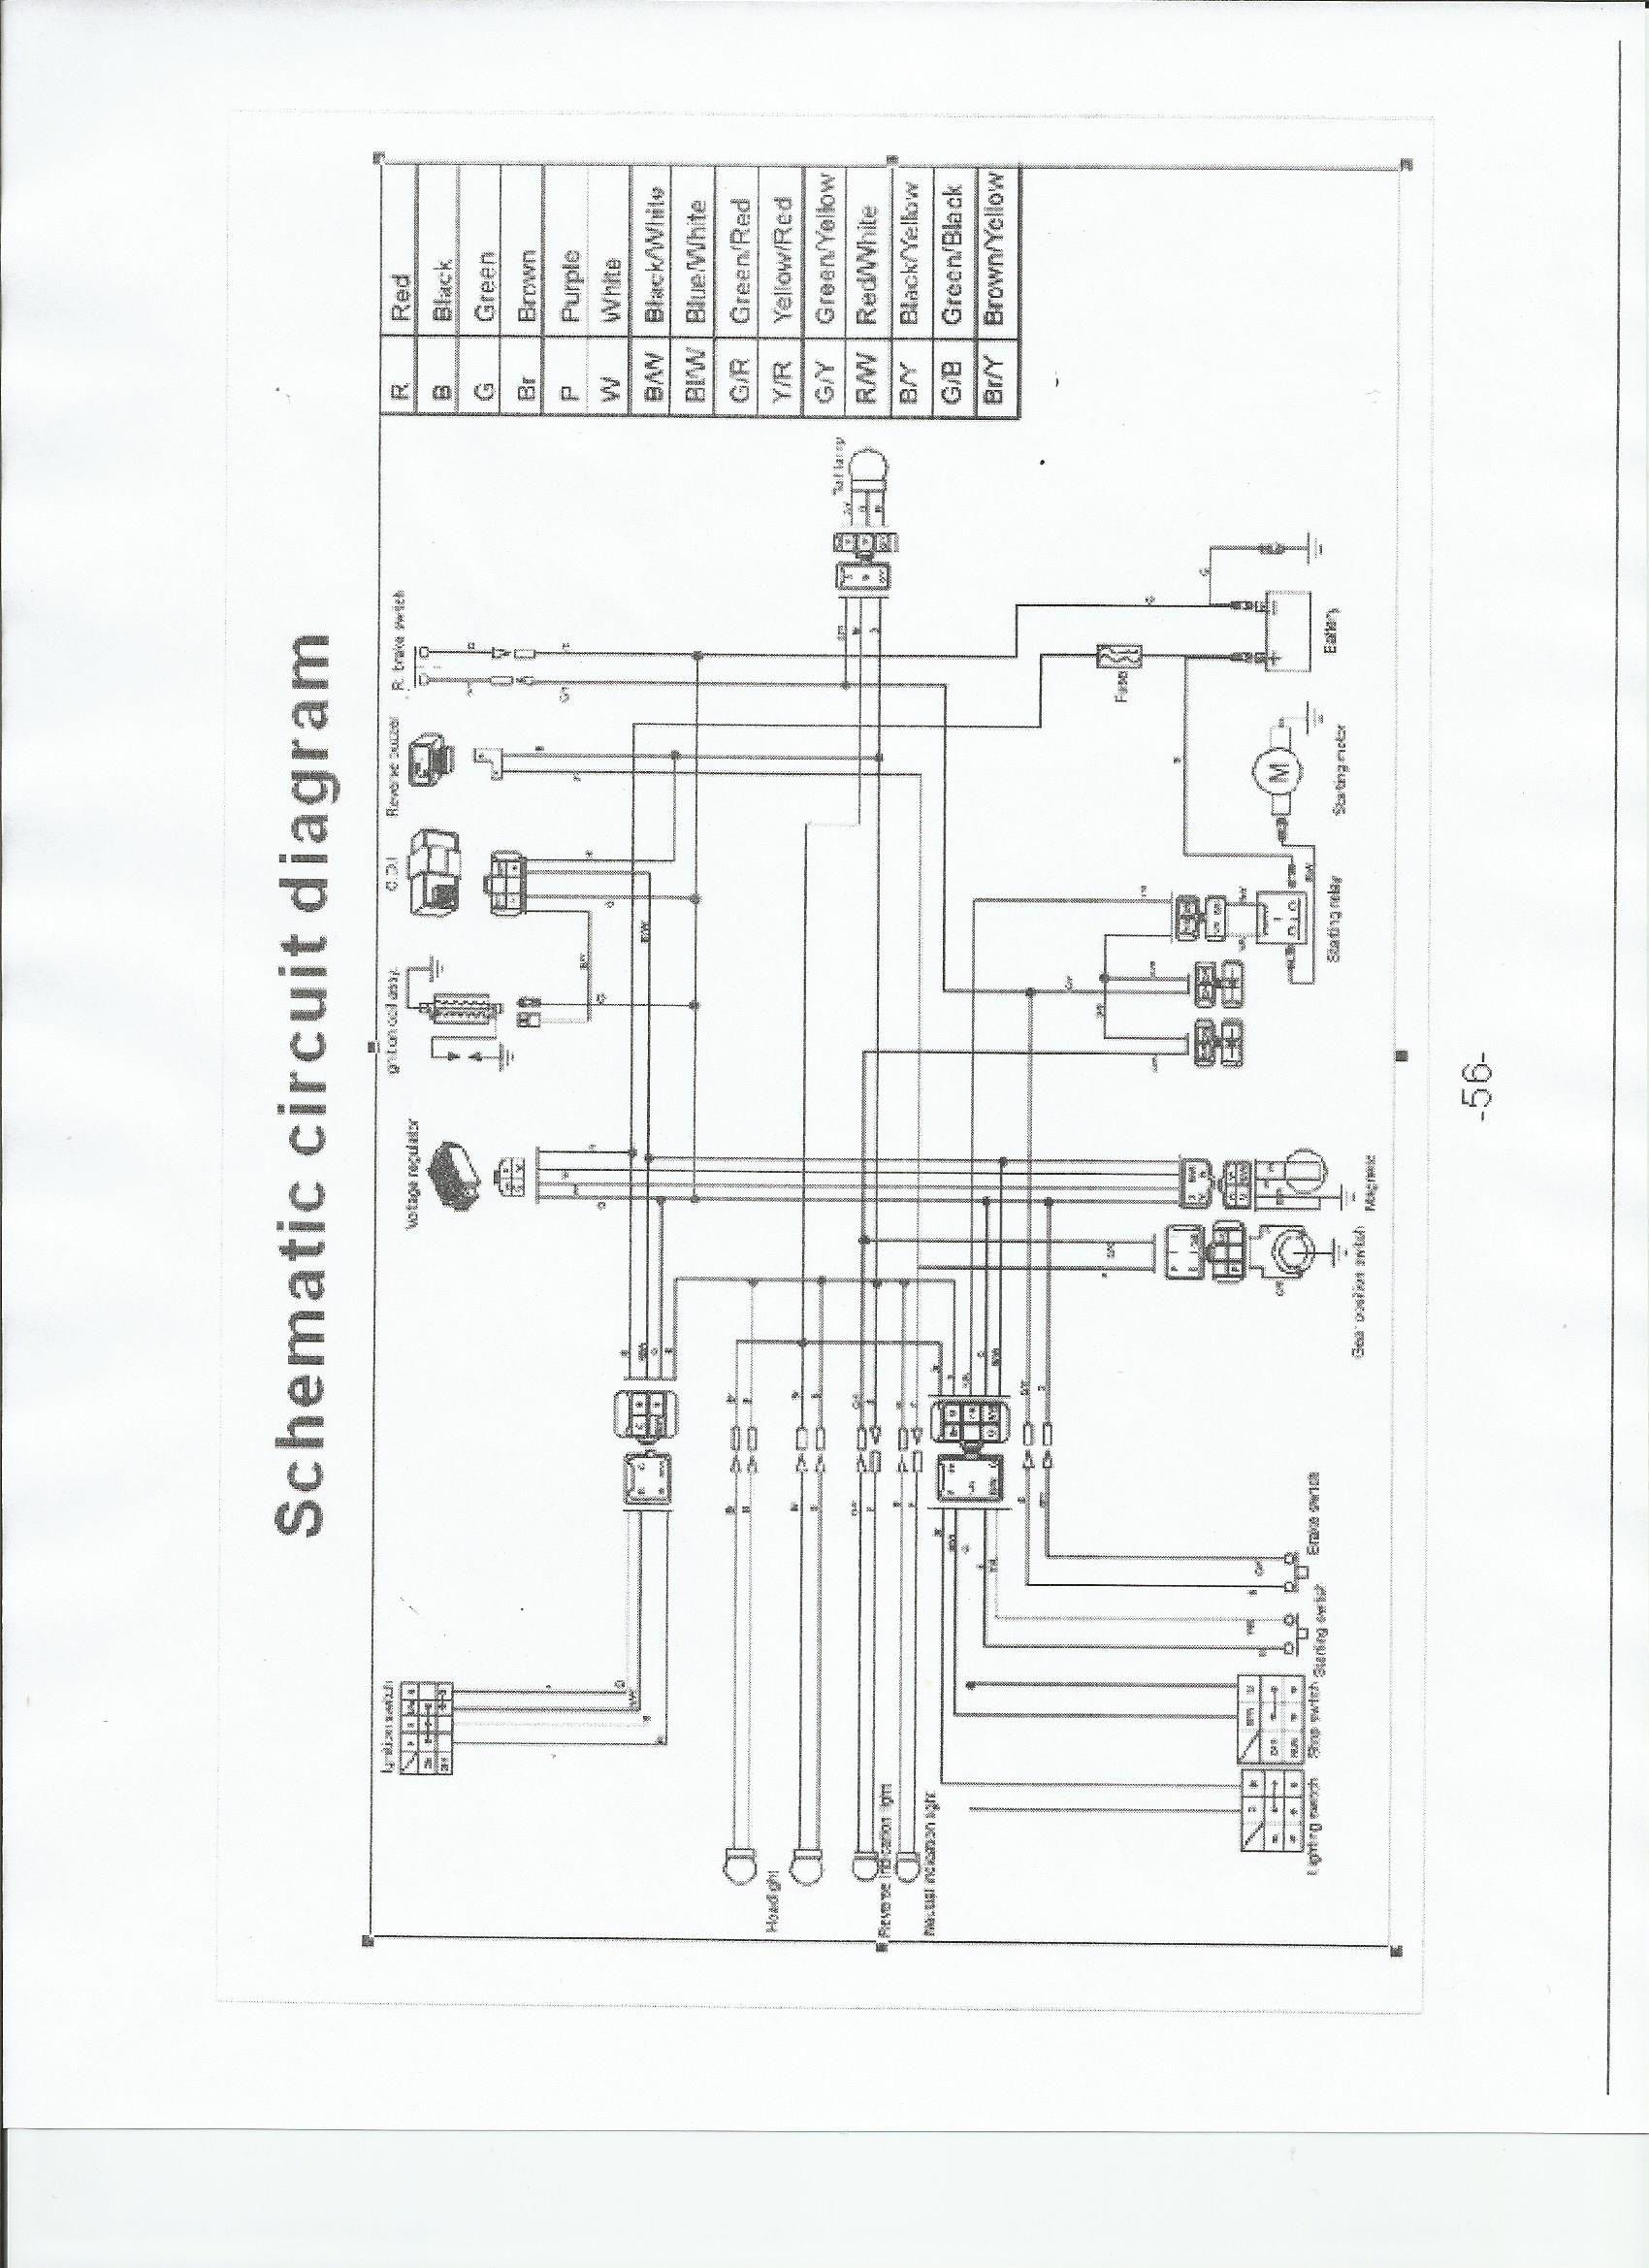 2005 baja 90 atv wiring diagram